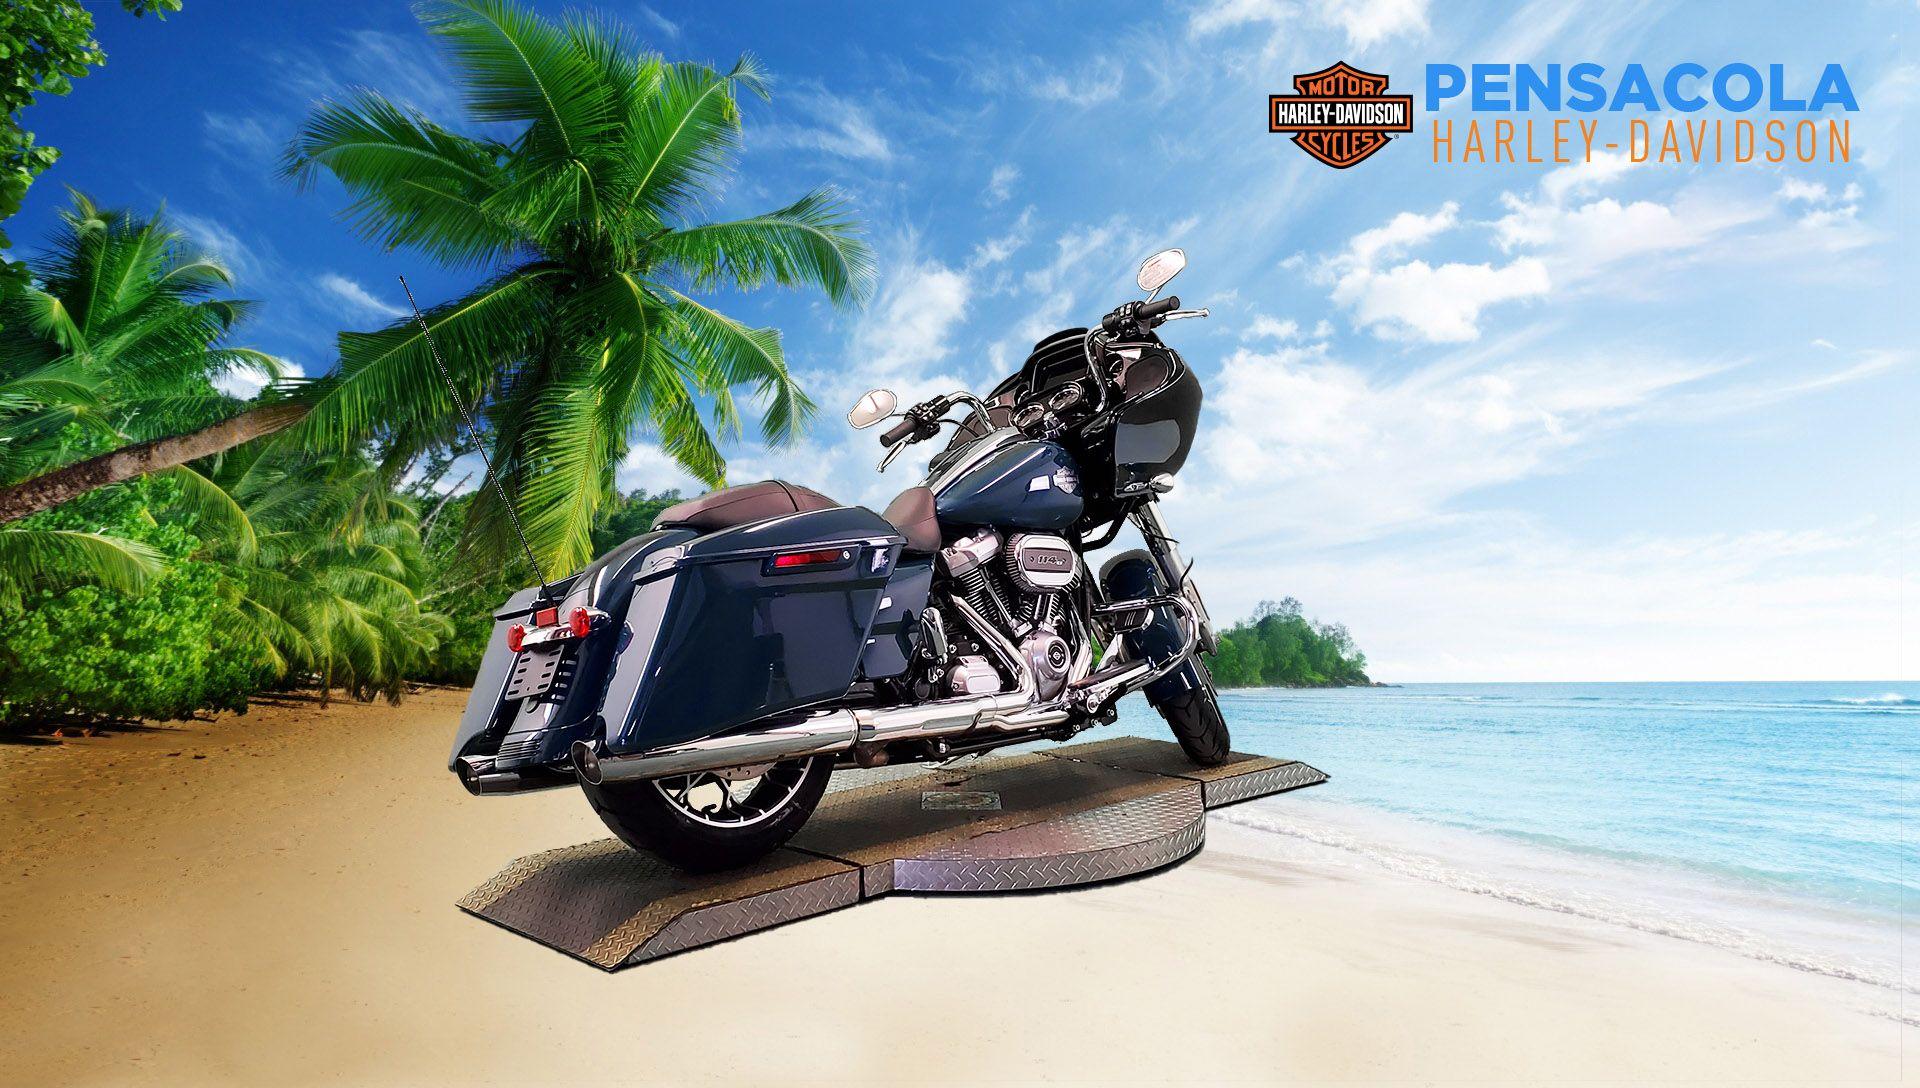 New 2021 Harley-Davidson Road Glide Special FLTRXS